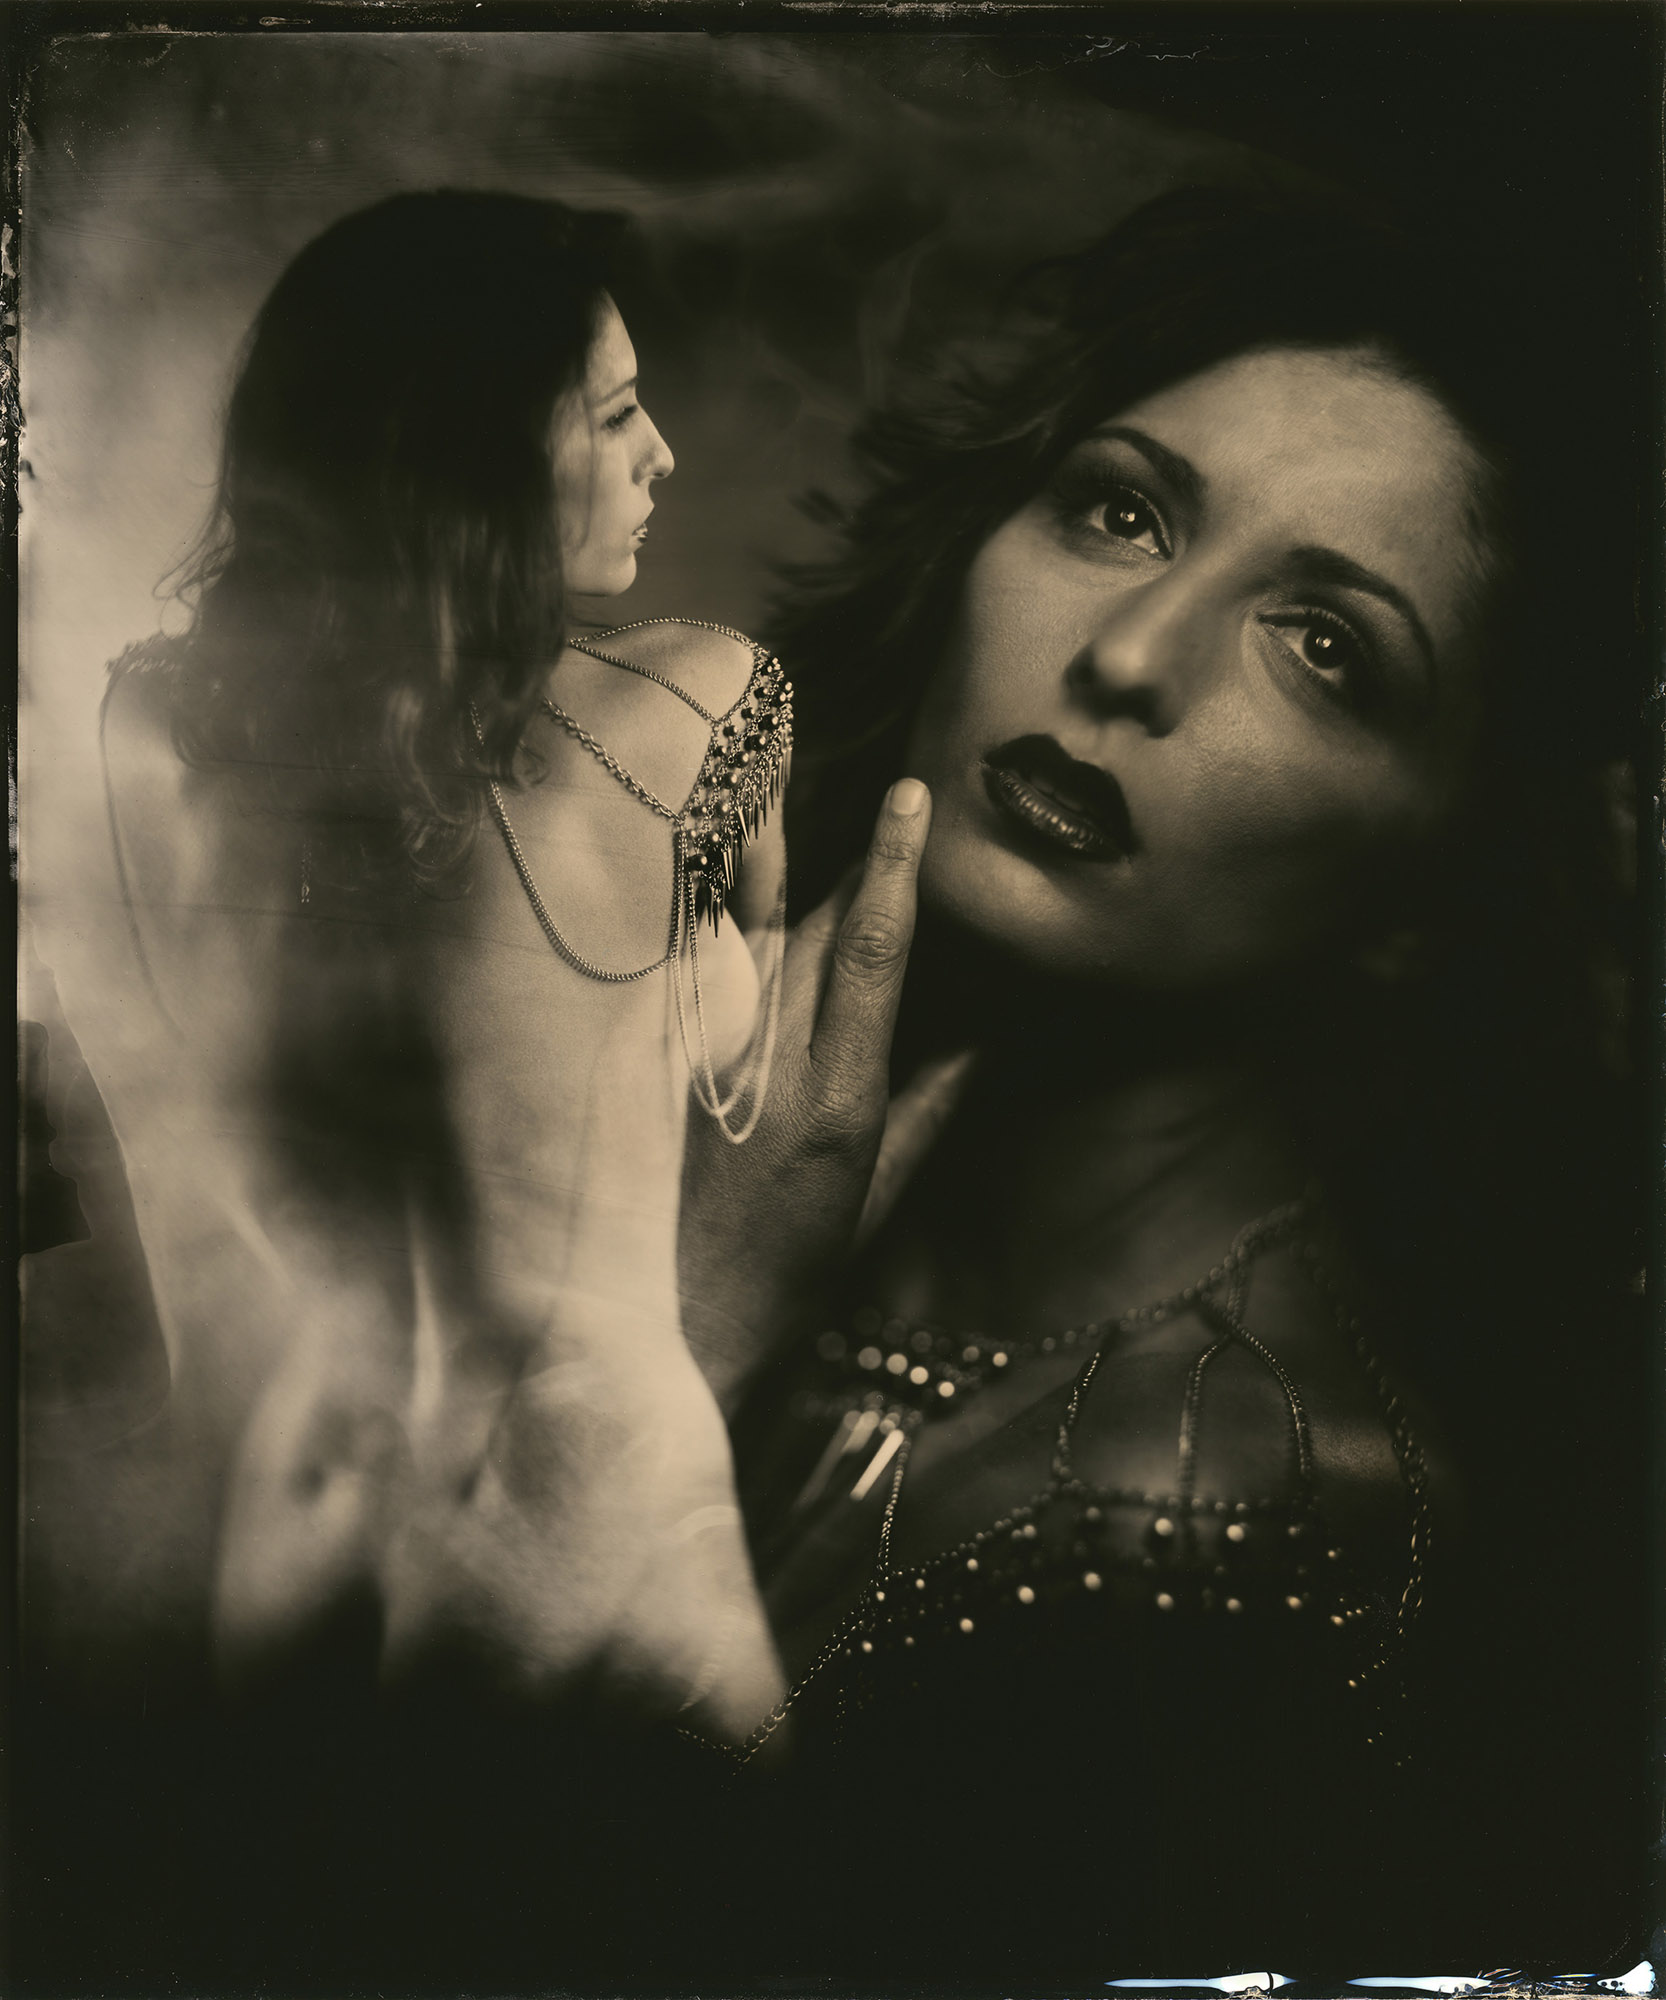 Carlotta - By:Scott Basile  www.blackarttintype.com